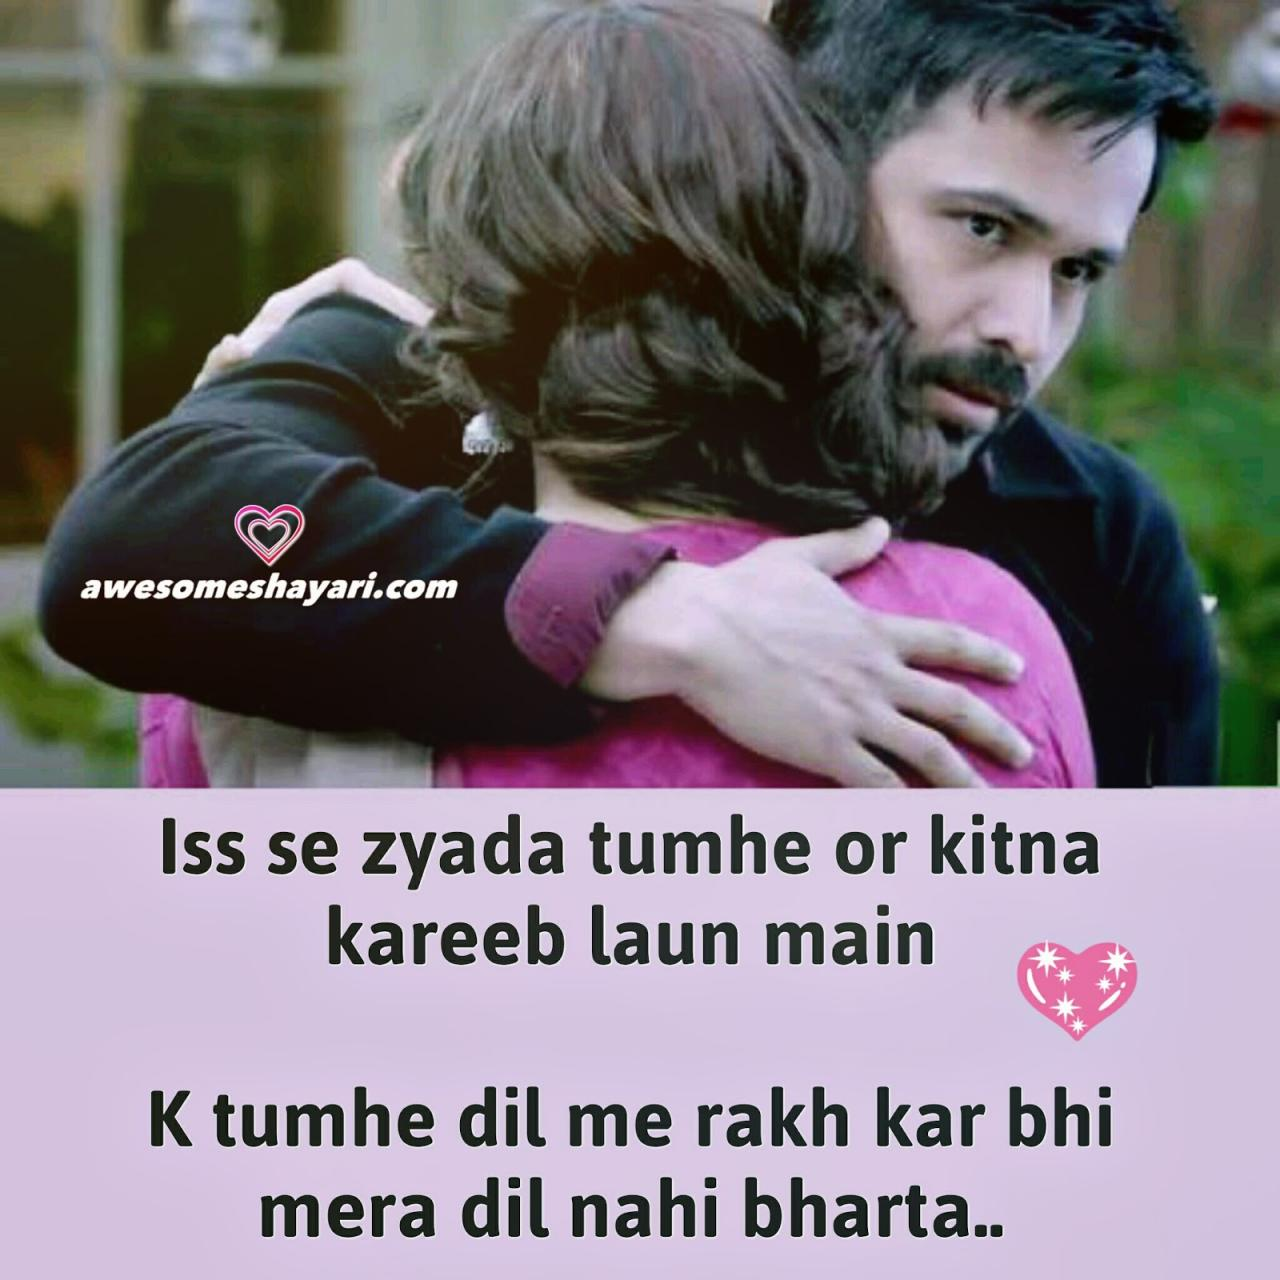 Best Love Shayari Awesome Shayari For Whatsapp Shayari On Love Romantic Love Shayari Valentine Day Shayari Valentine Day Shayari